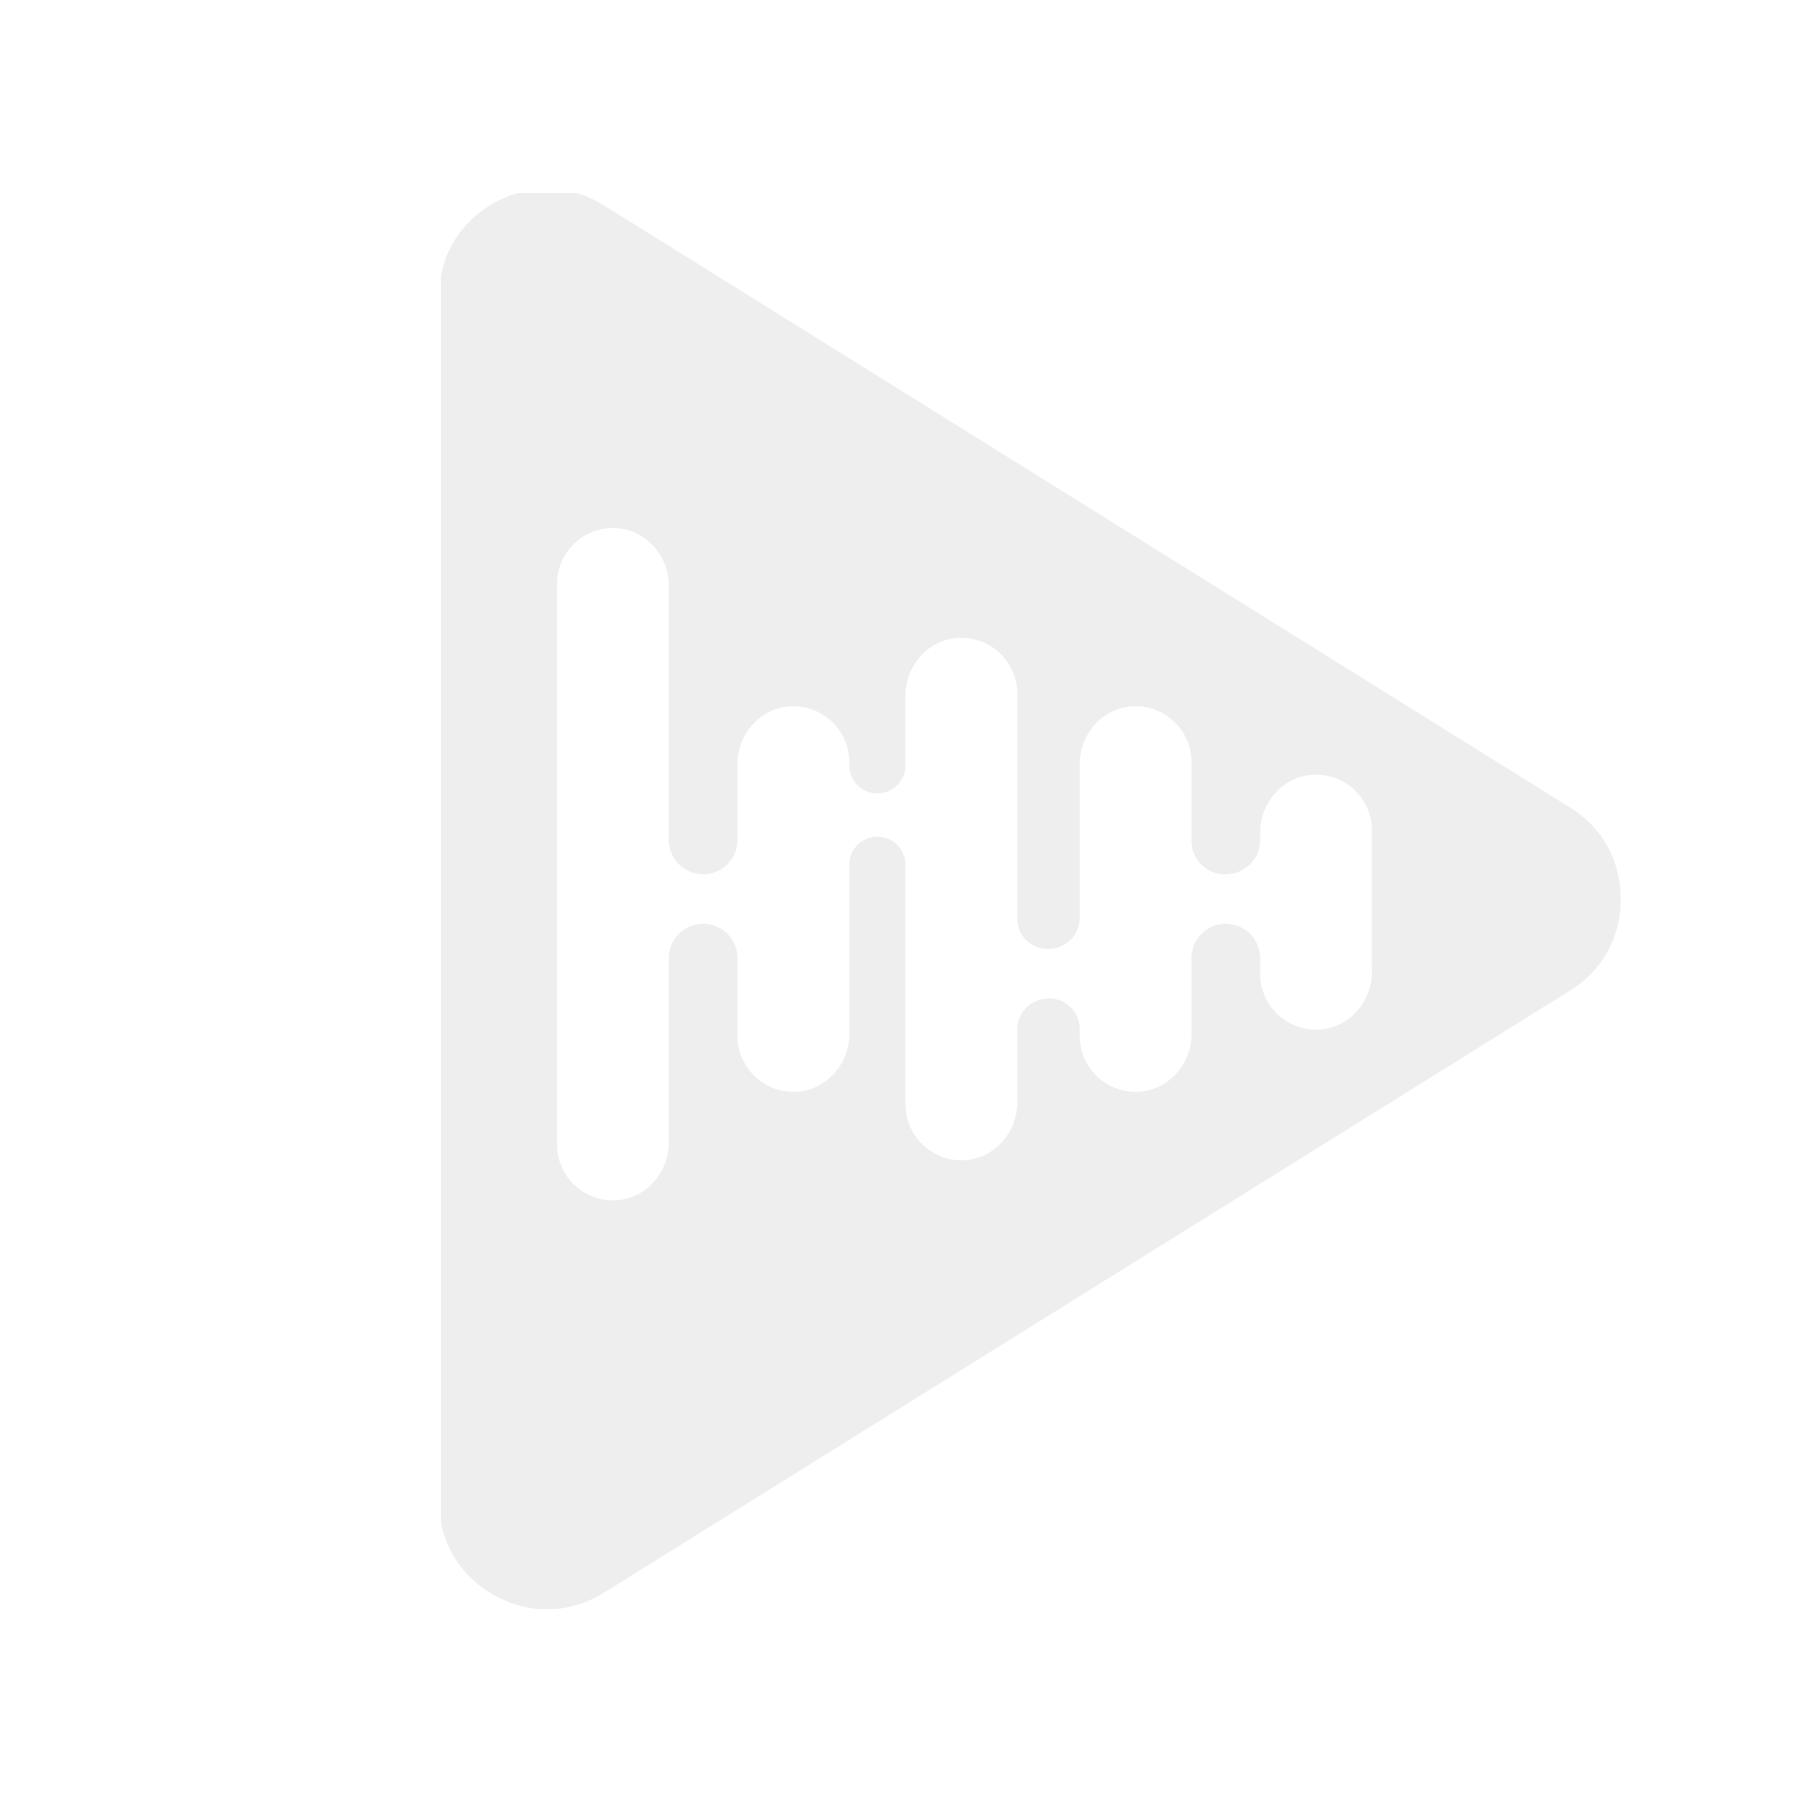 Kufatec Fistune 40150